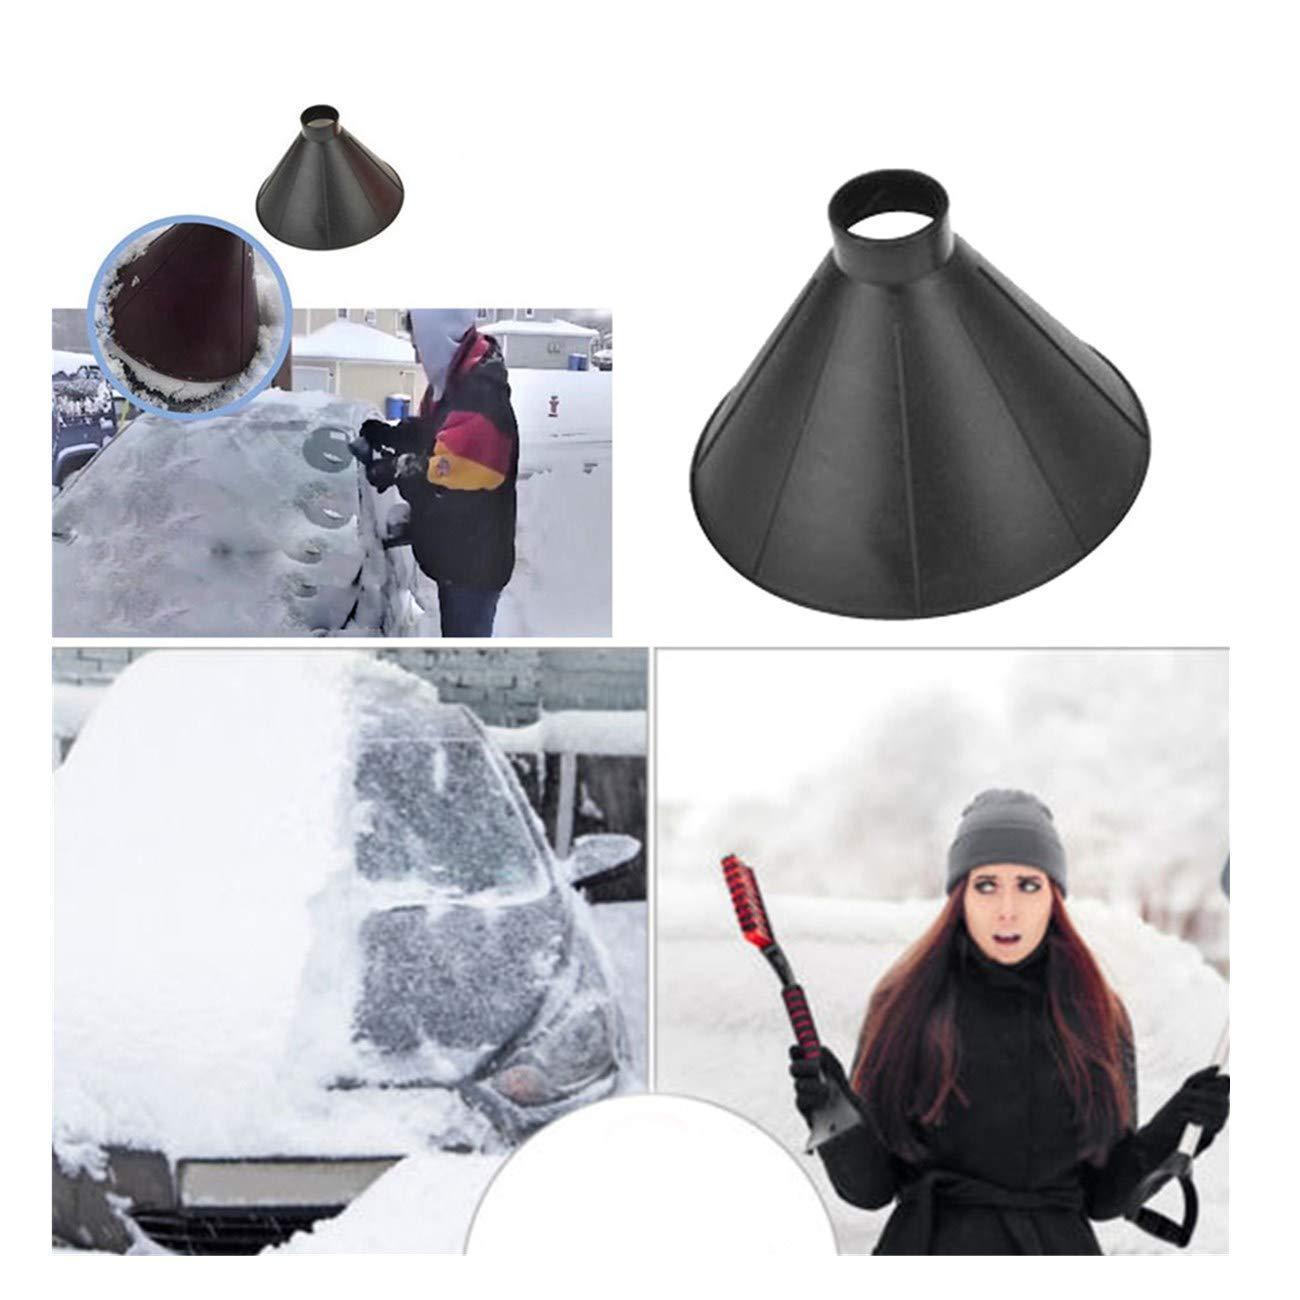 Challyhope Scrape A Round Magic Cone-Shaped Windshield Ice Scraper Snow Becomes A Funnel Car Accessories (Black)